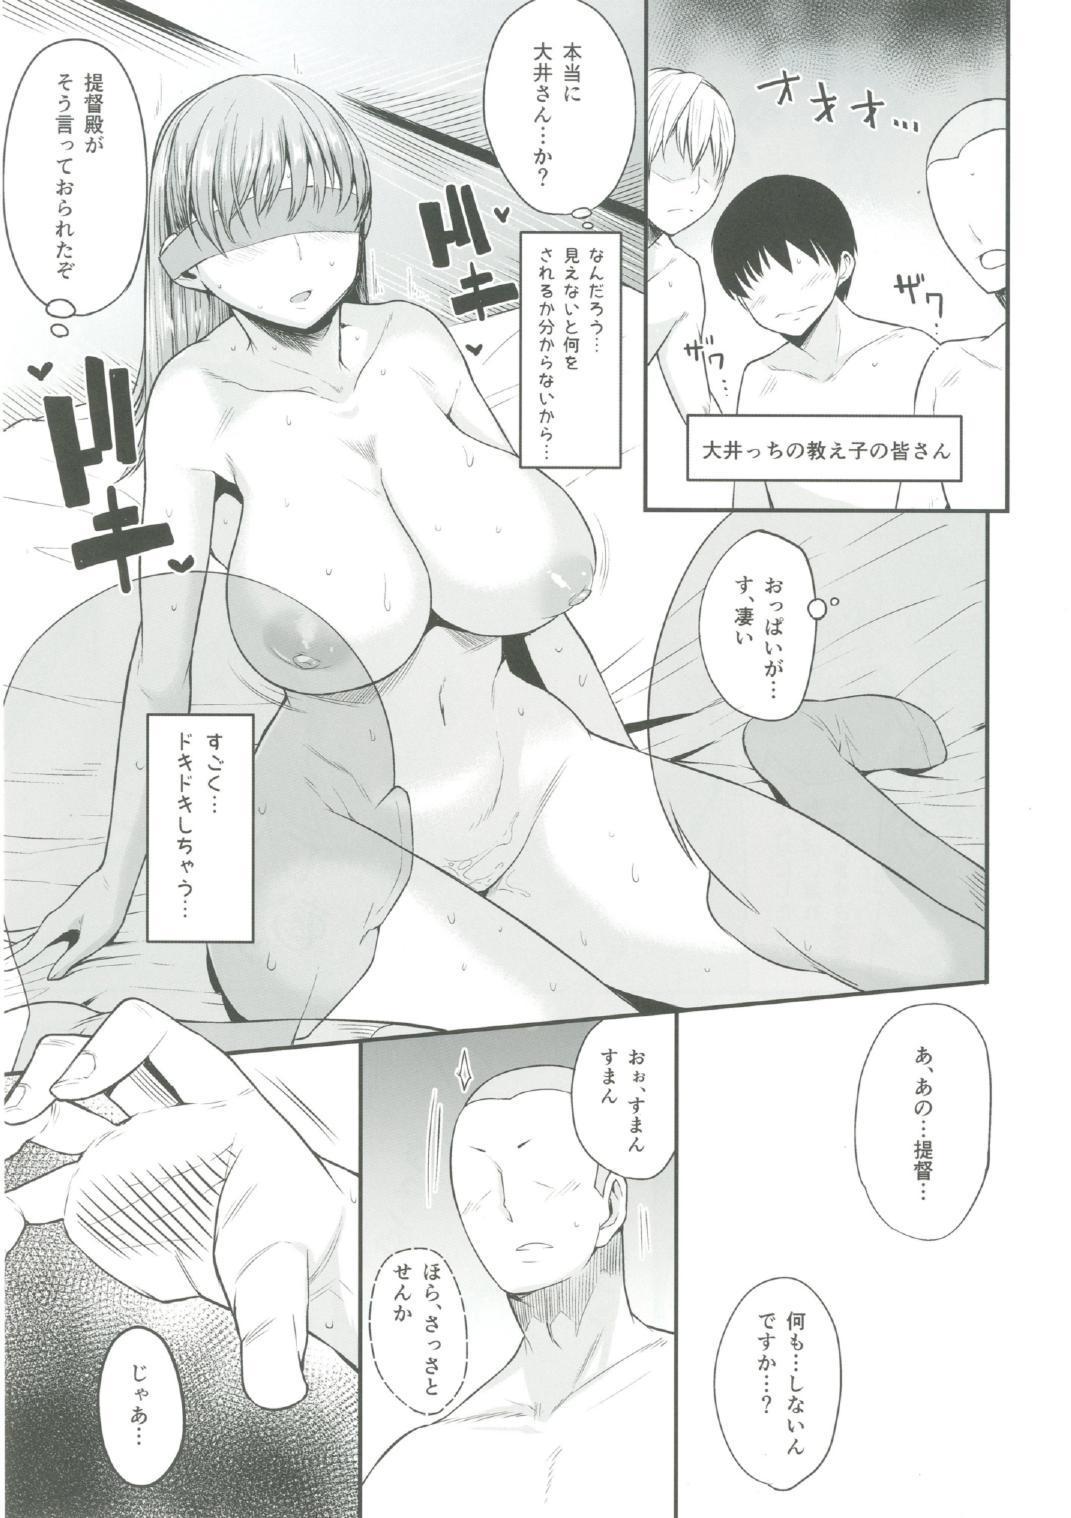 Ooicchi wa Teitoku no Iinaricchi San 12